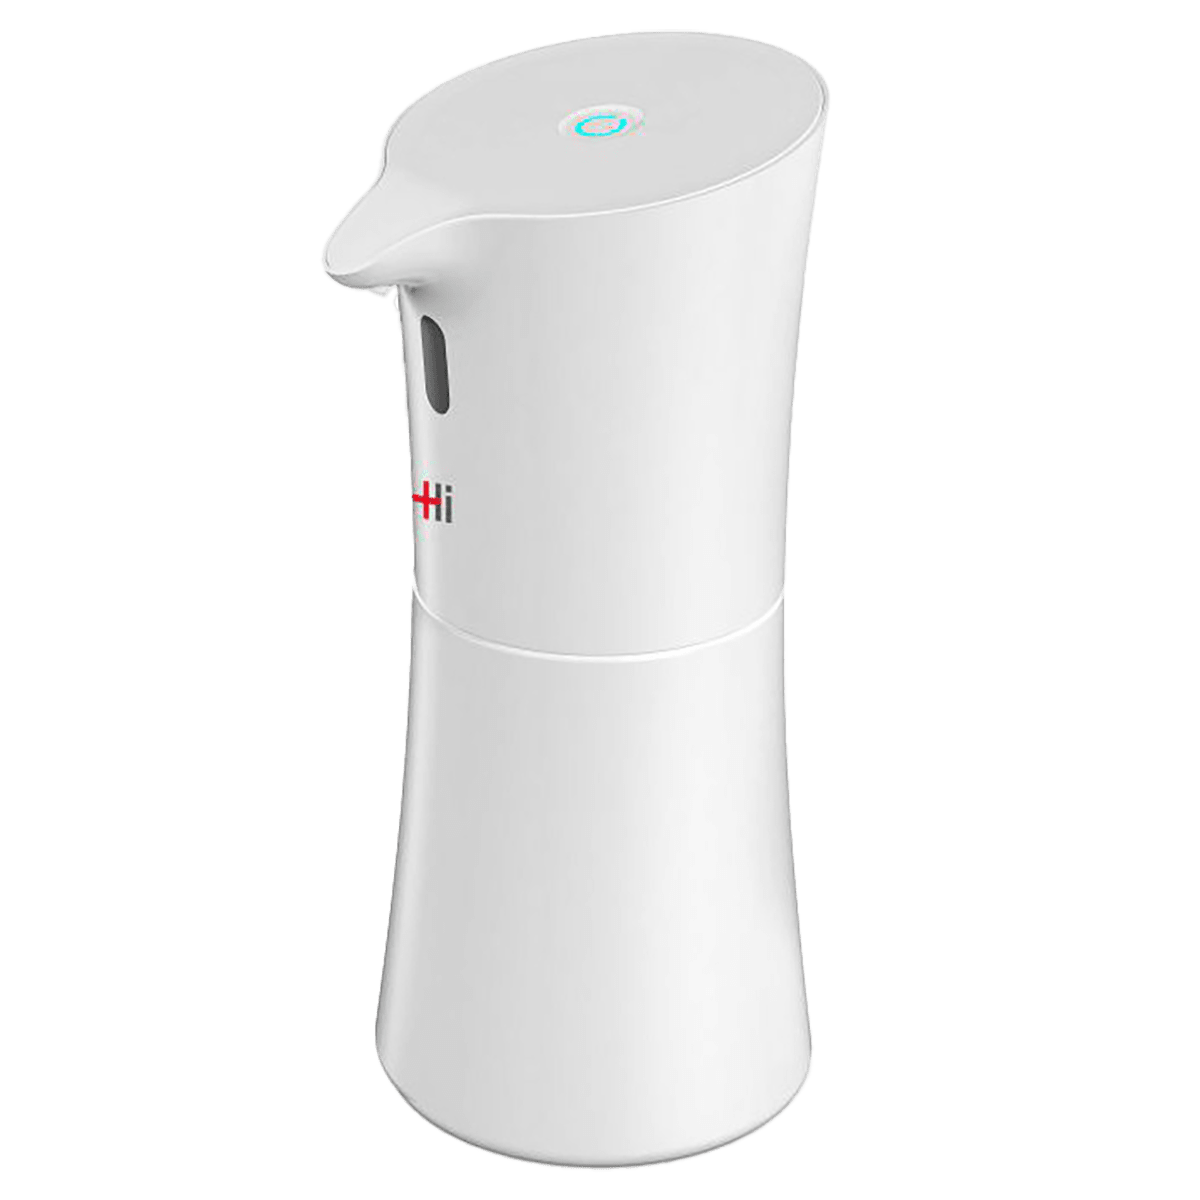 Hi-Genie Slinky Battery Powered Automatic Sanitizer Dispenser (Automatic Infrared Sensor, HG-001, White)